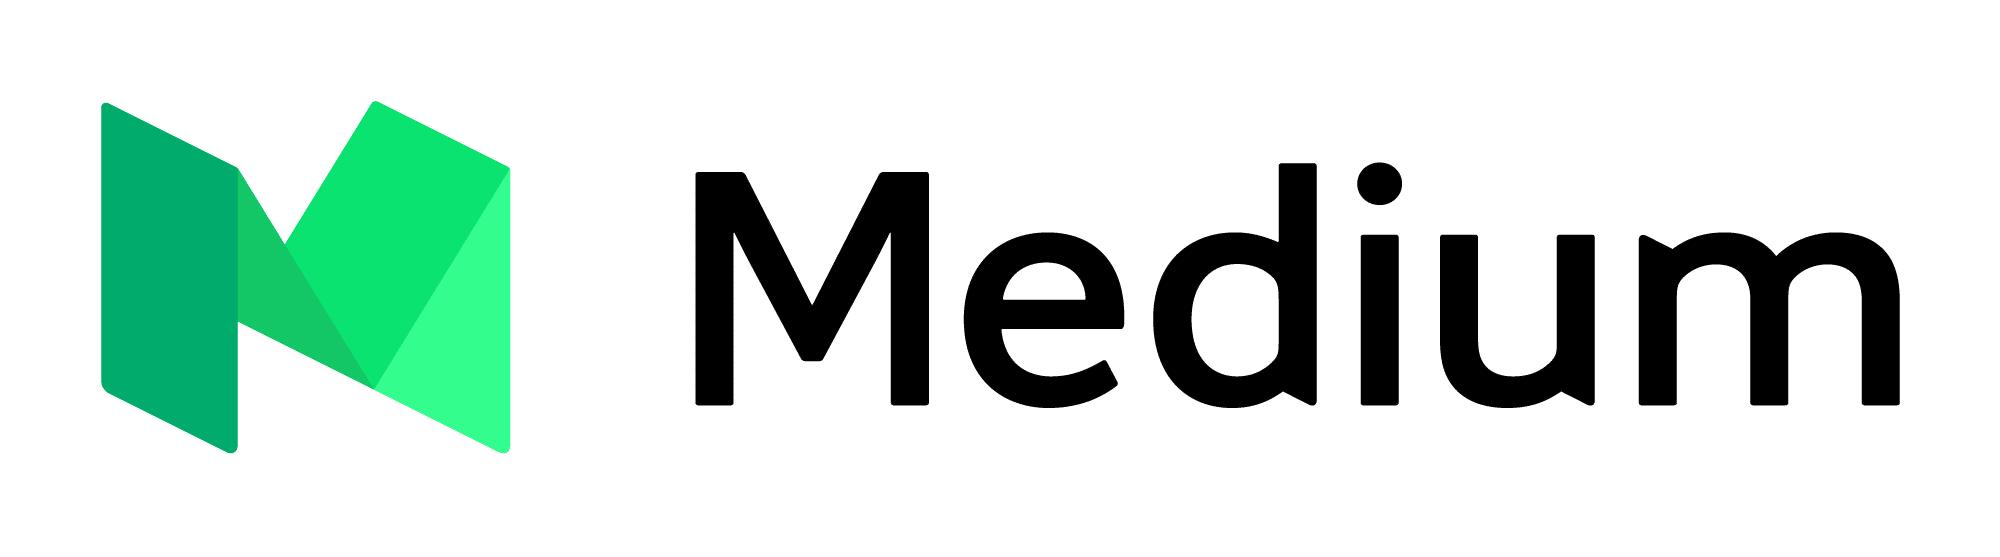 medium-com-logo-fullsize-1